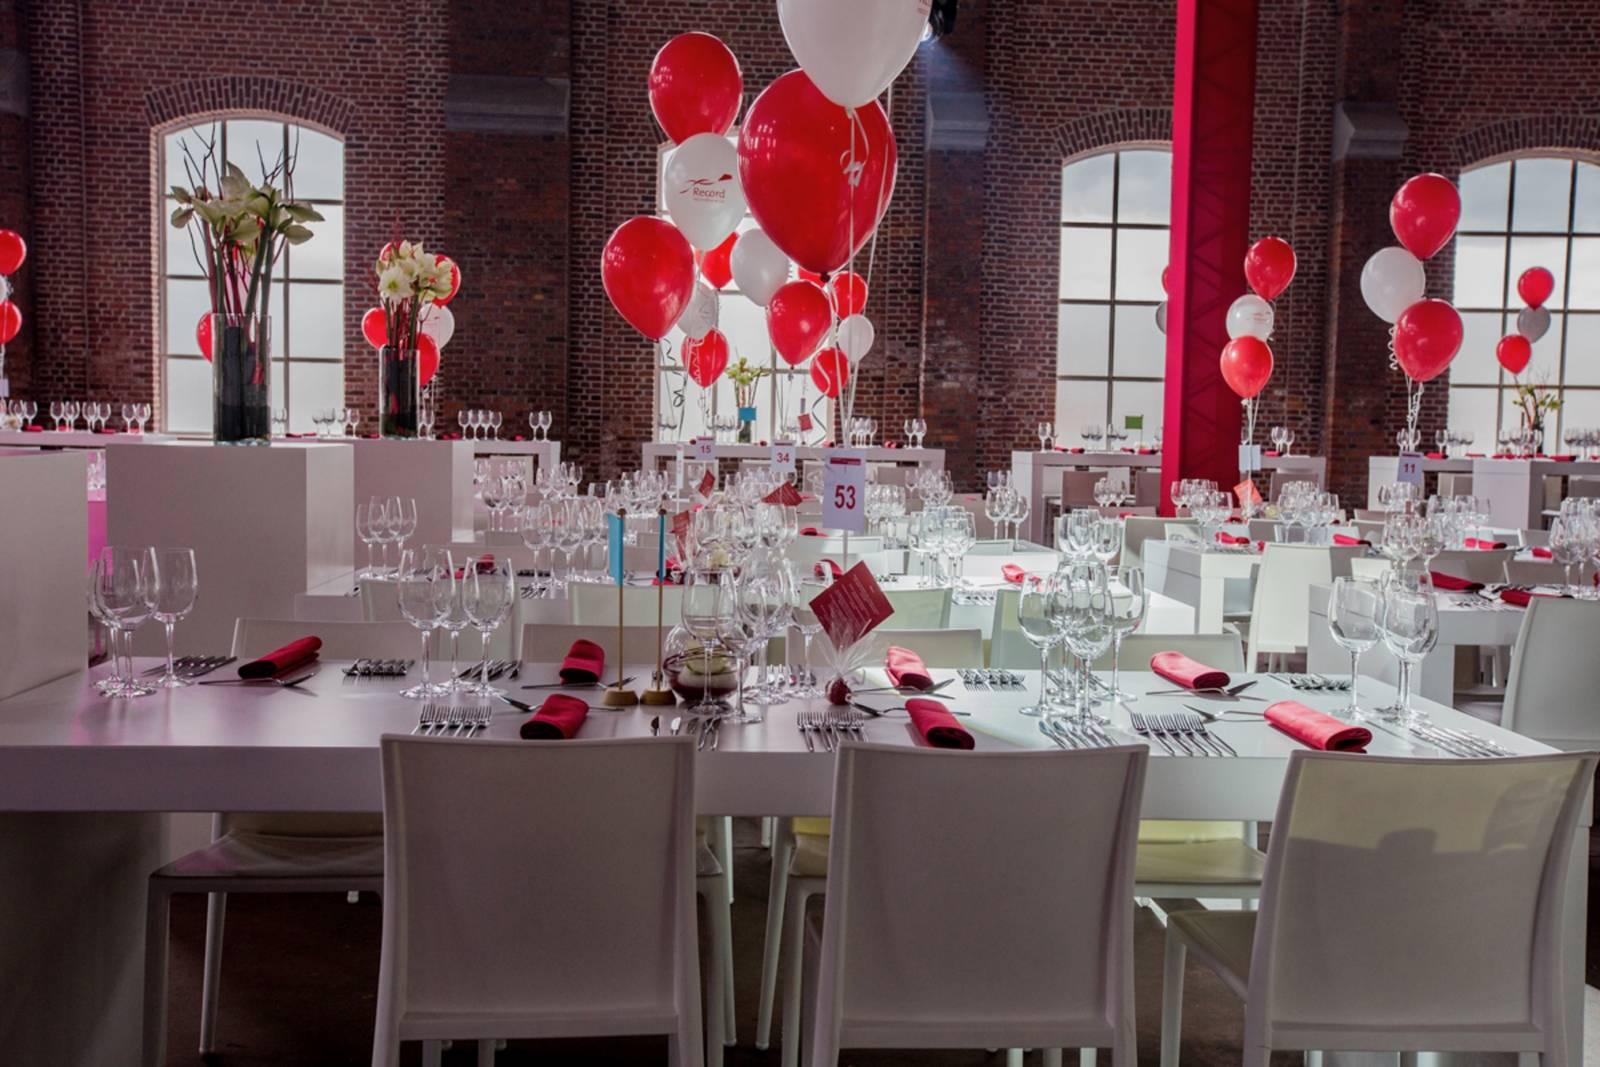 Hangar 43 - Feestzaal Oost-Vlaanderen - Industrieel - House of Weddings - 10